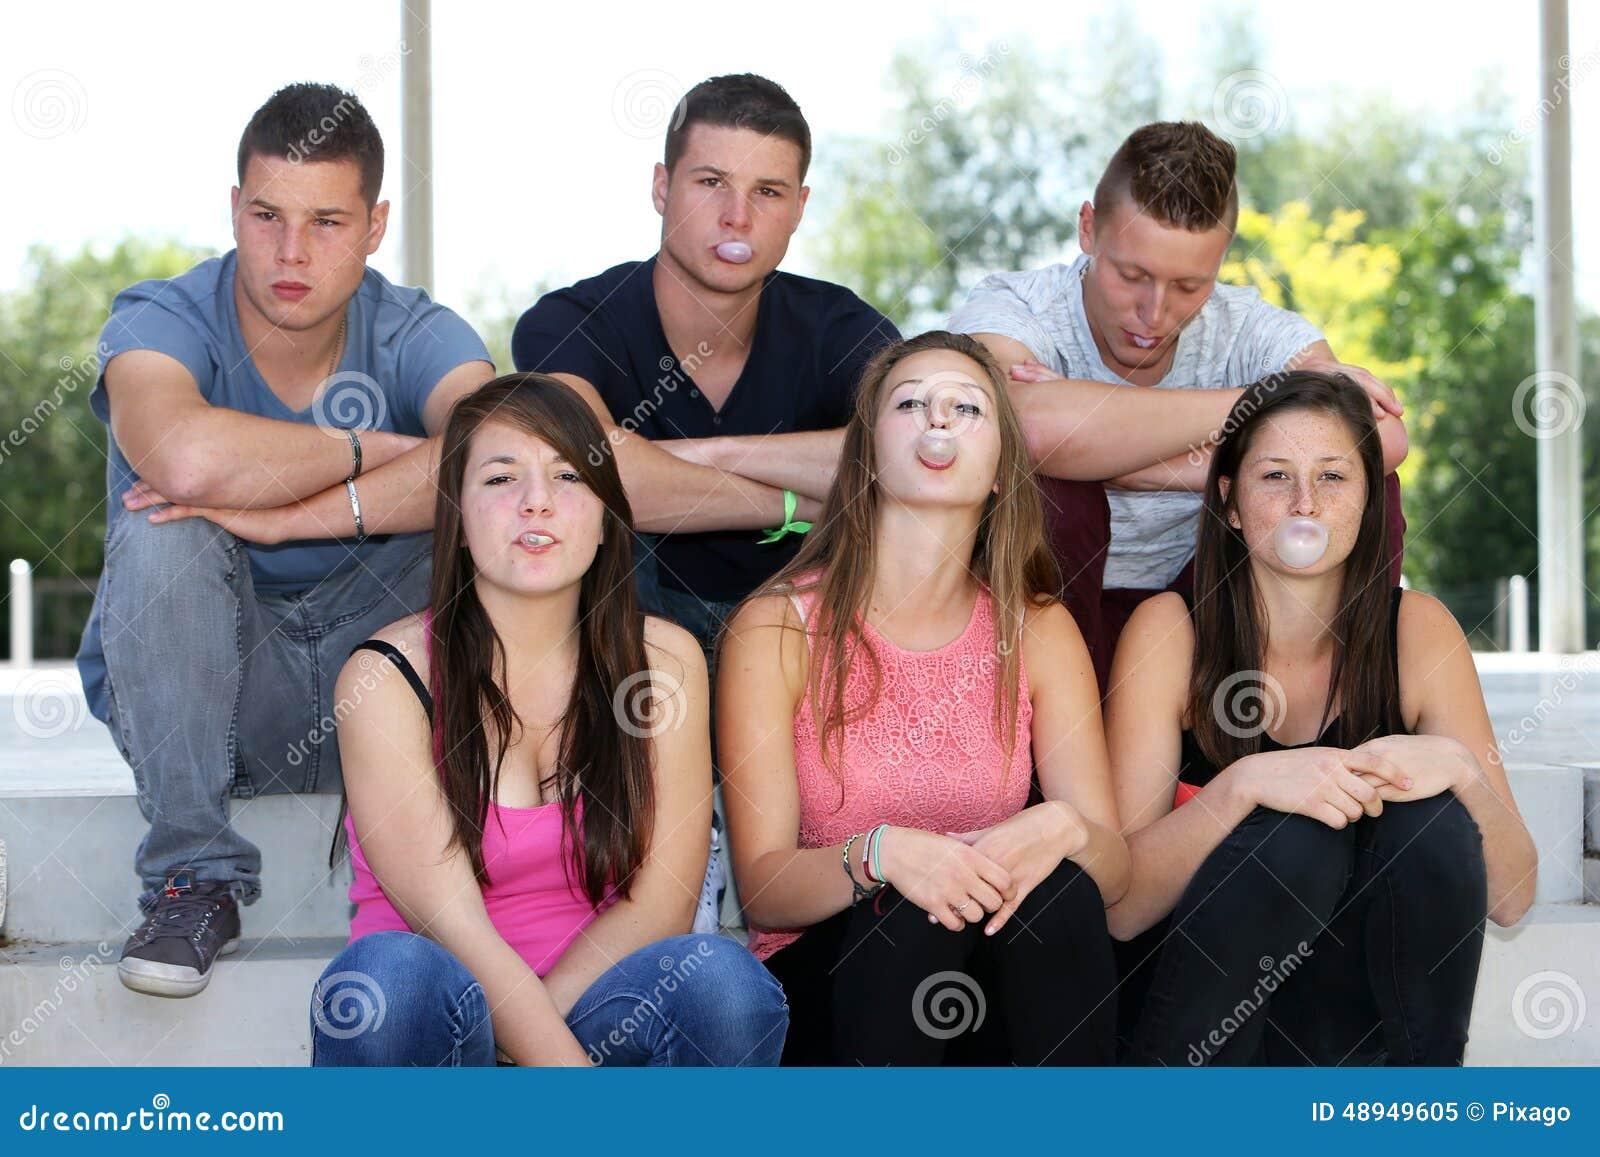 girl-royalty-free-group-of-teens